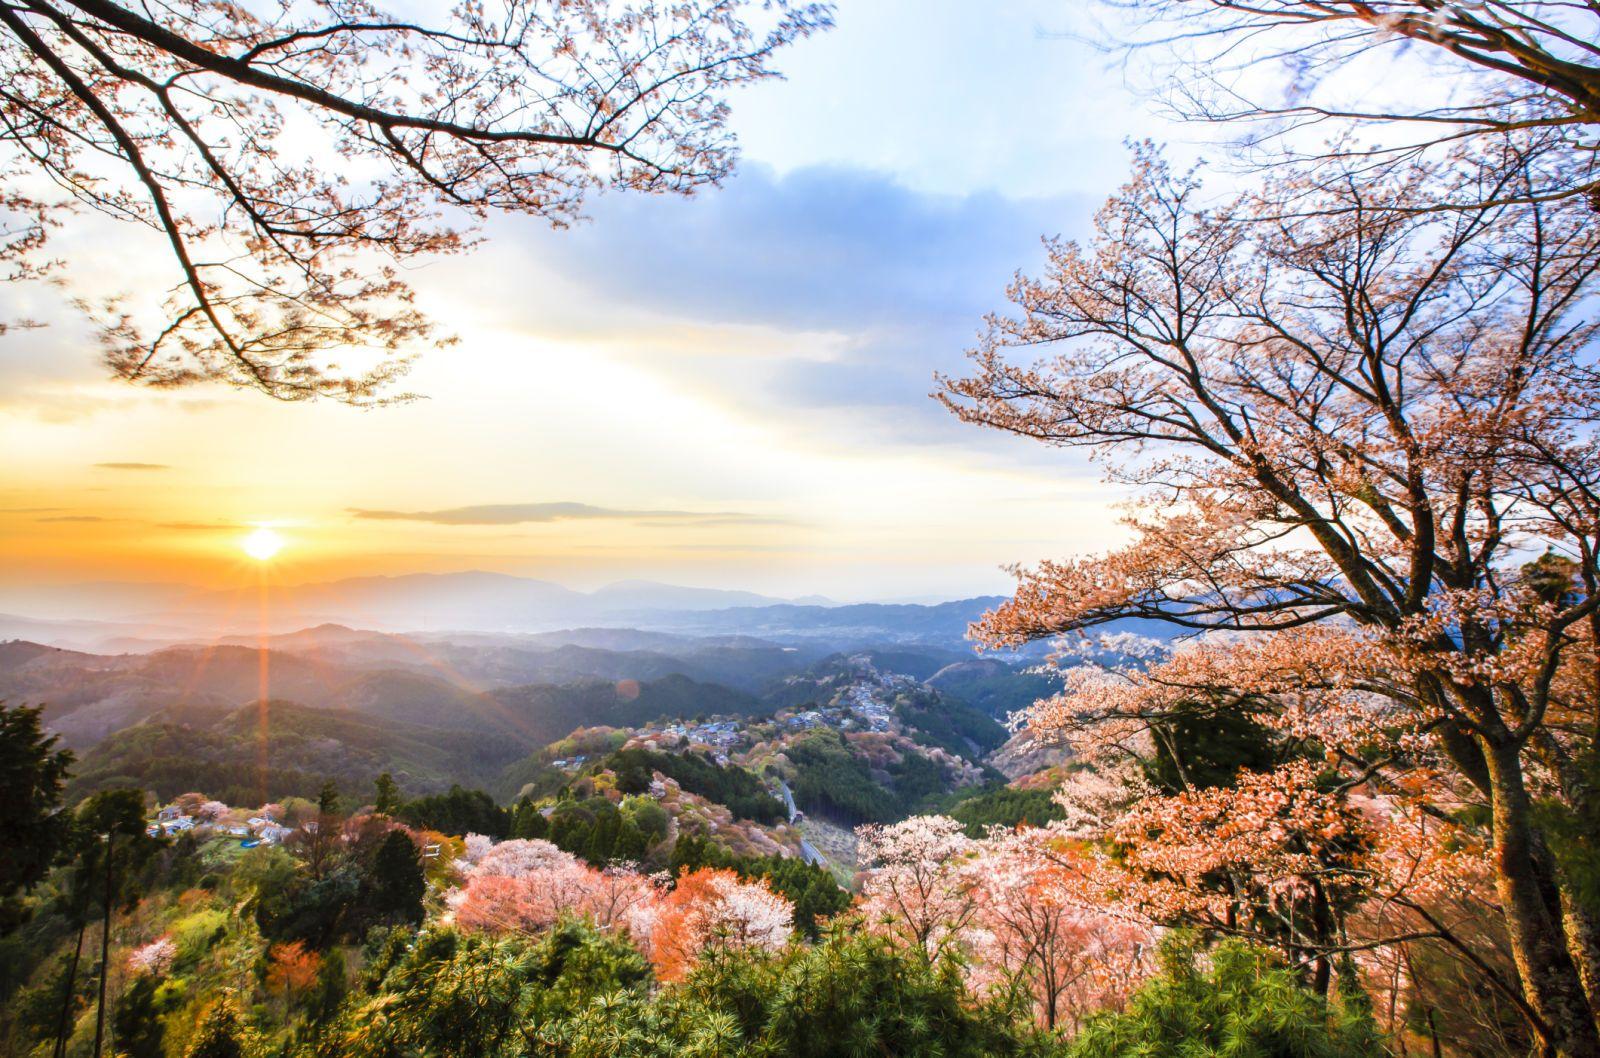 Cherry Blossom Tree Facts That You Definitely Never Knew Before Blossom Trees Cherry Blossom Cherry Blossom Tree